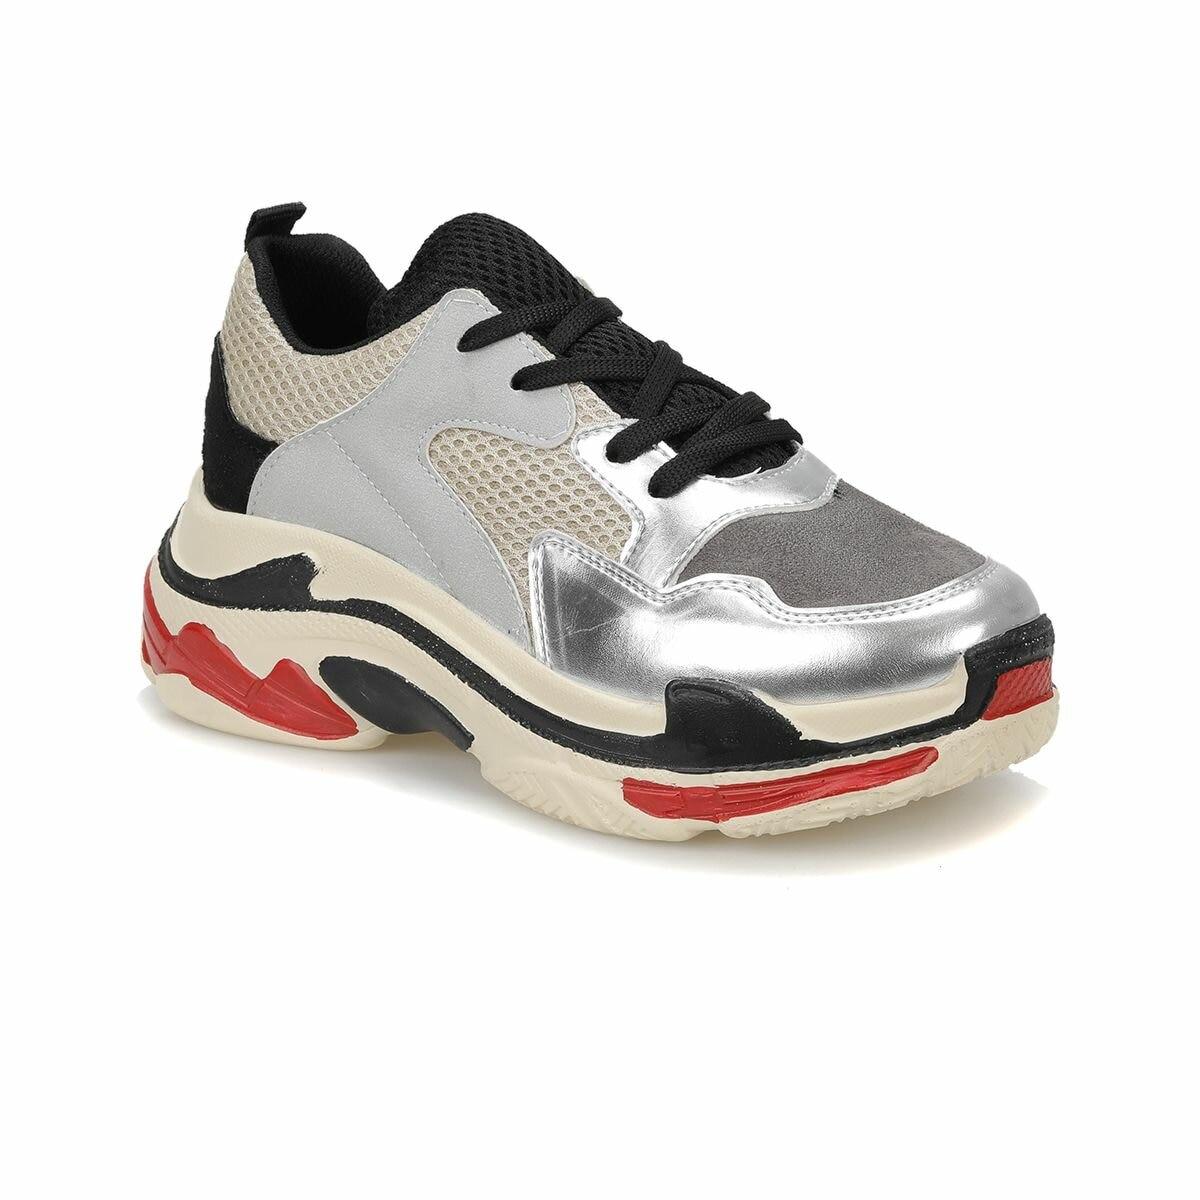 FLO 18K-821 Silver Women 'S Sports Shoes BUTIGO